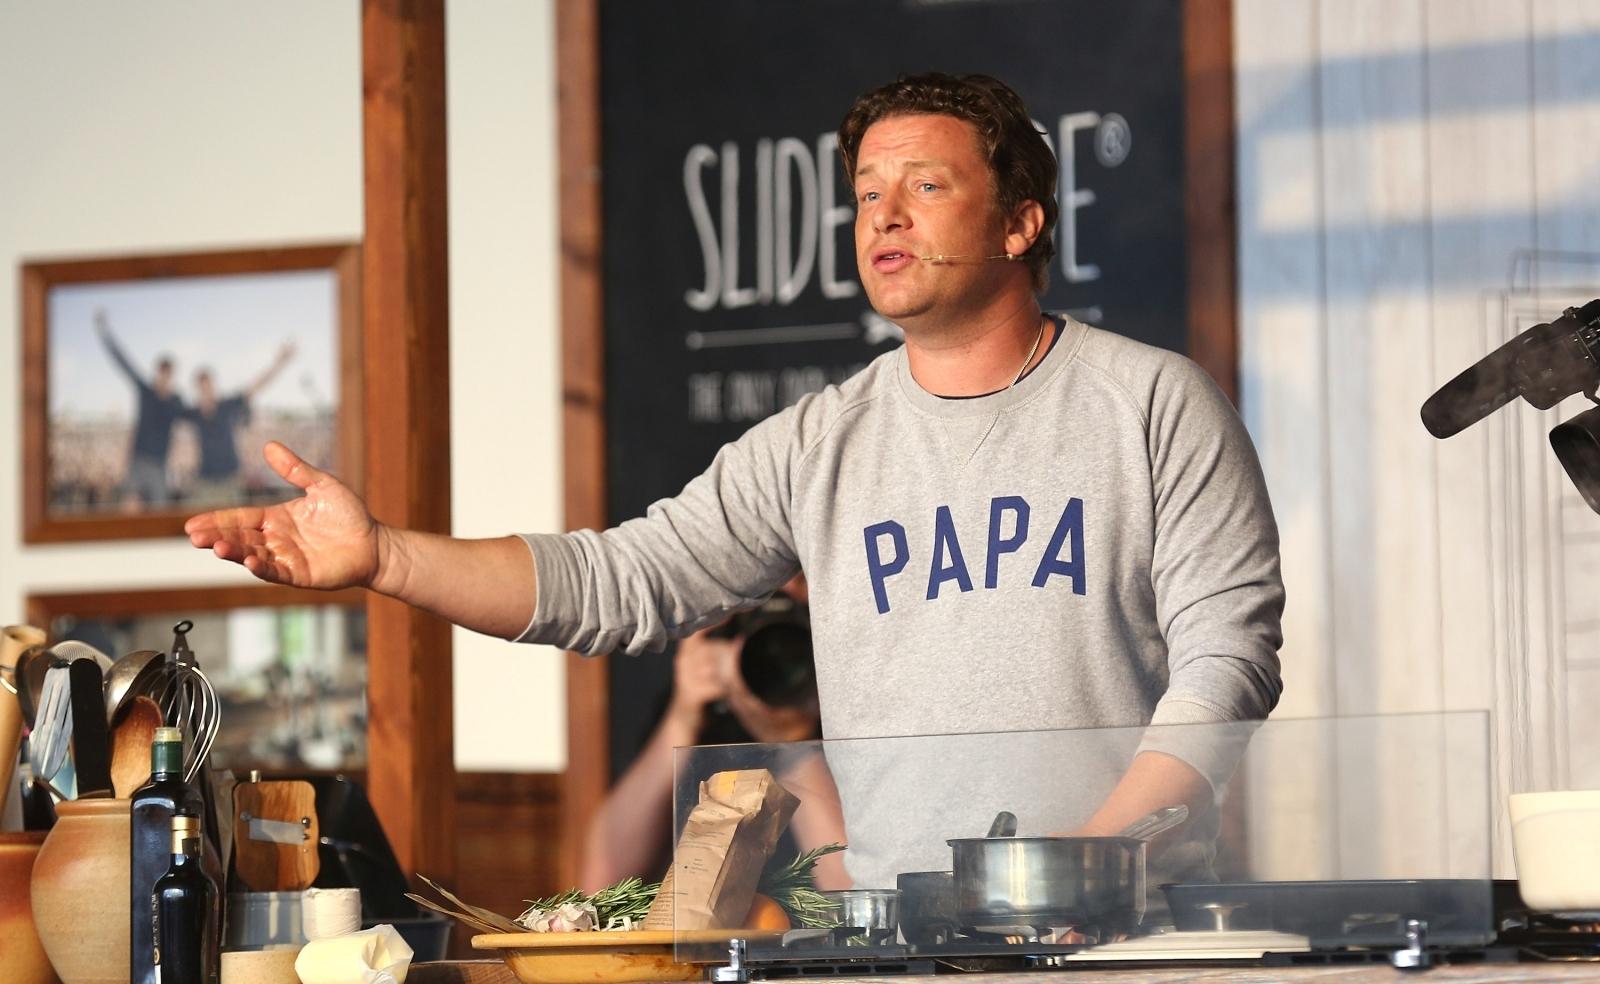 Jamie Oliver Says Vegans 'Annoy' Him